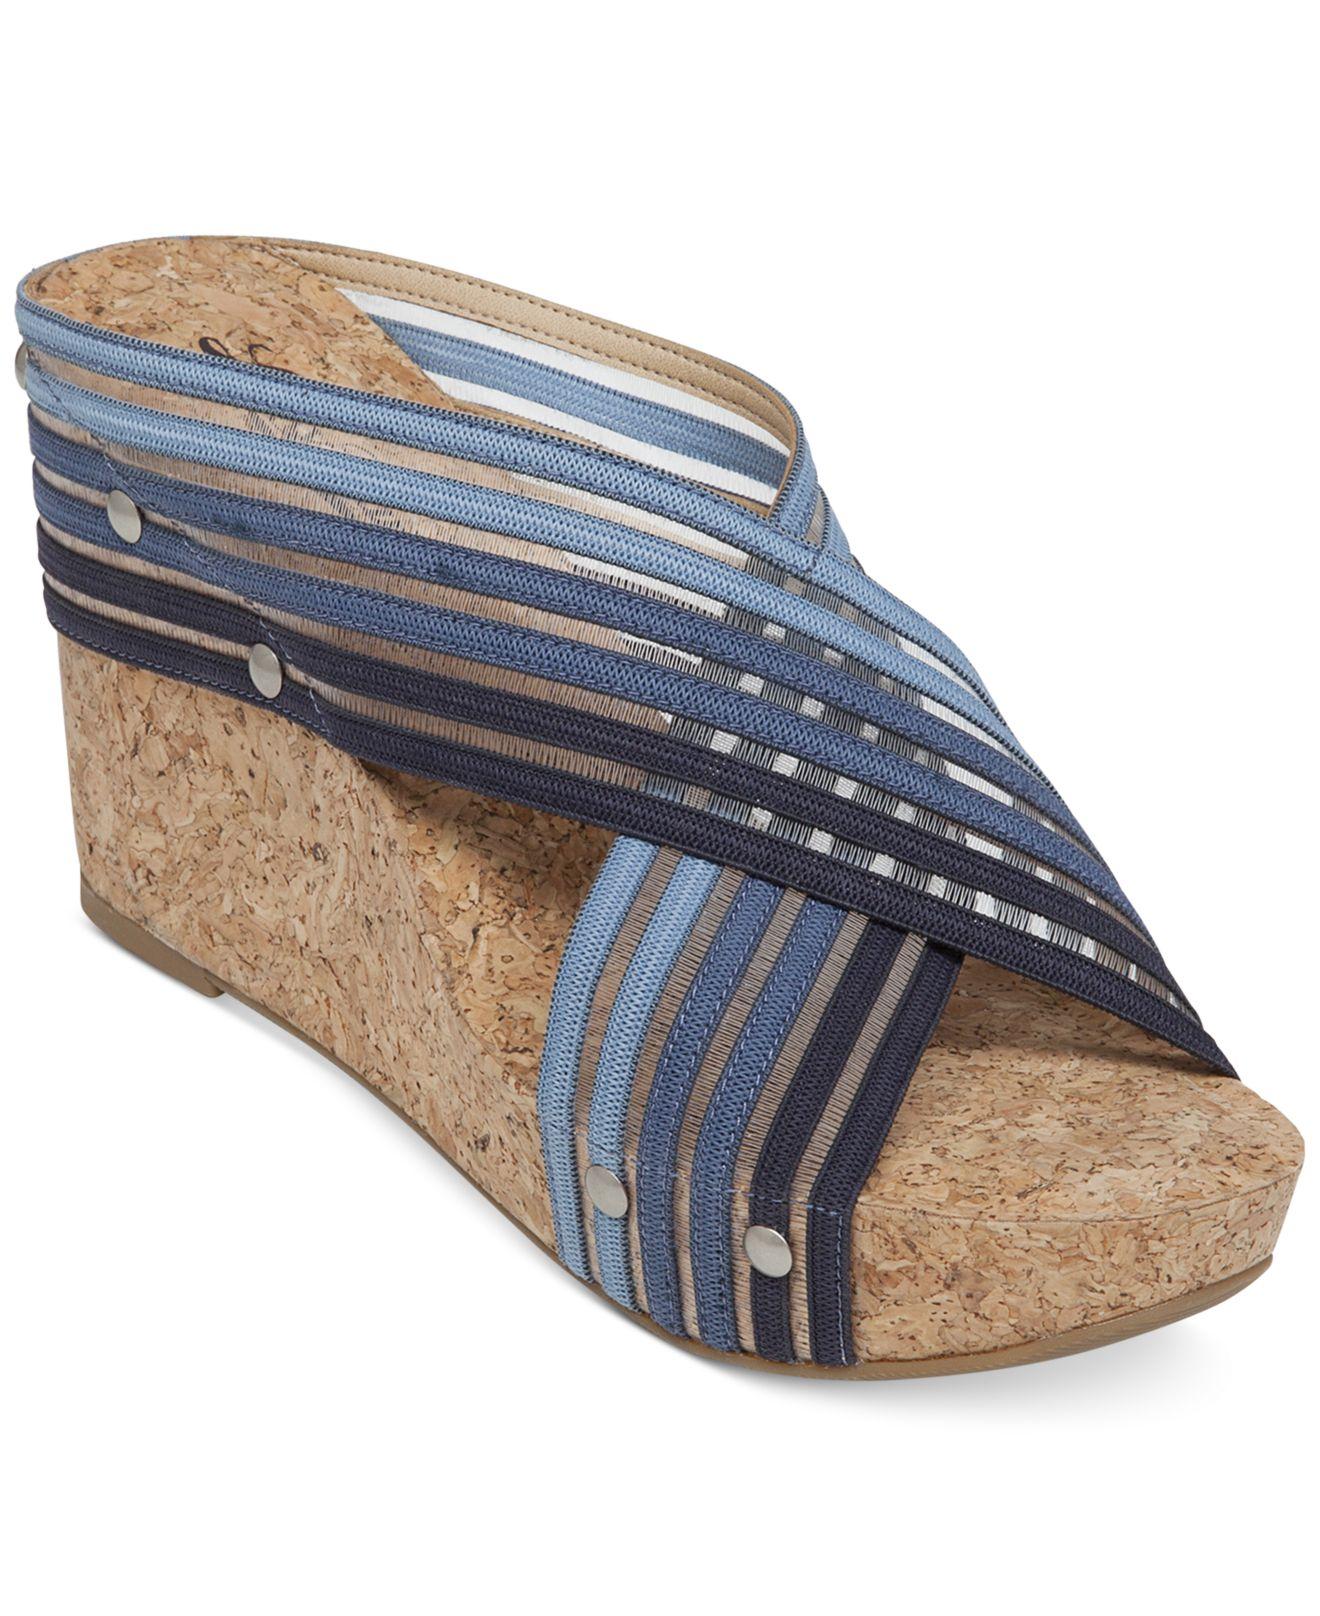 032cf4816e2 Lyst - Lucky Brand Miller2 Platform Wedge Sandals in Blue